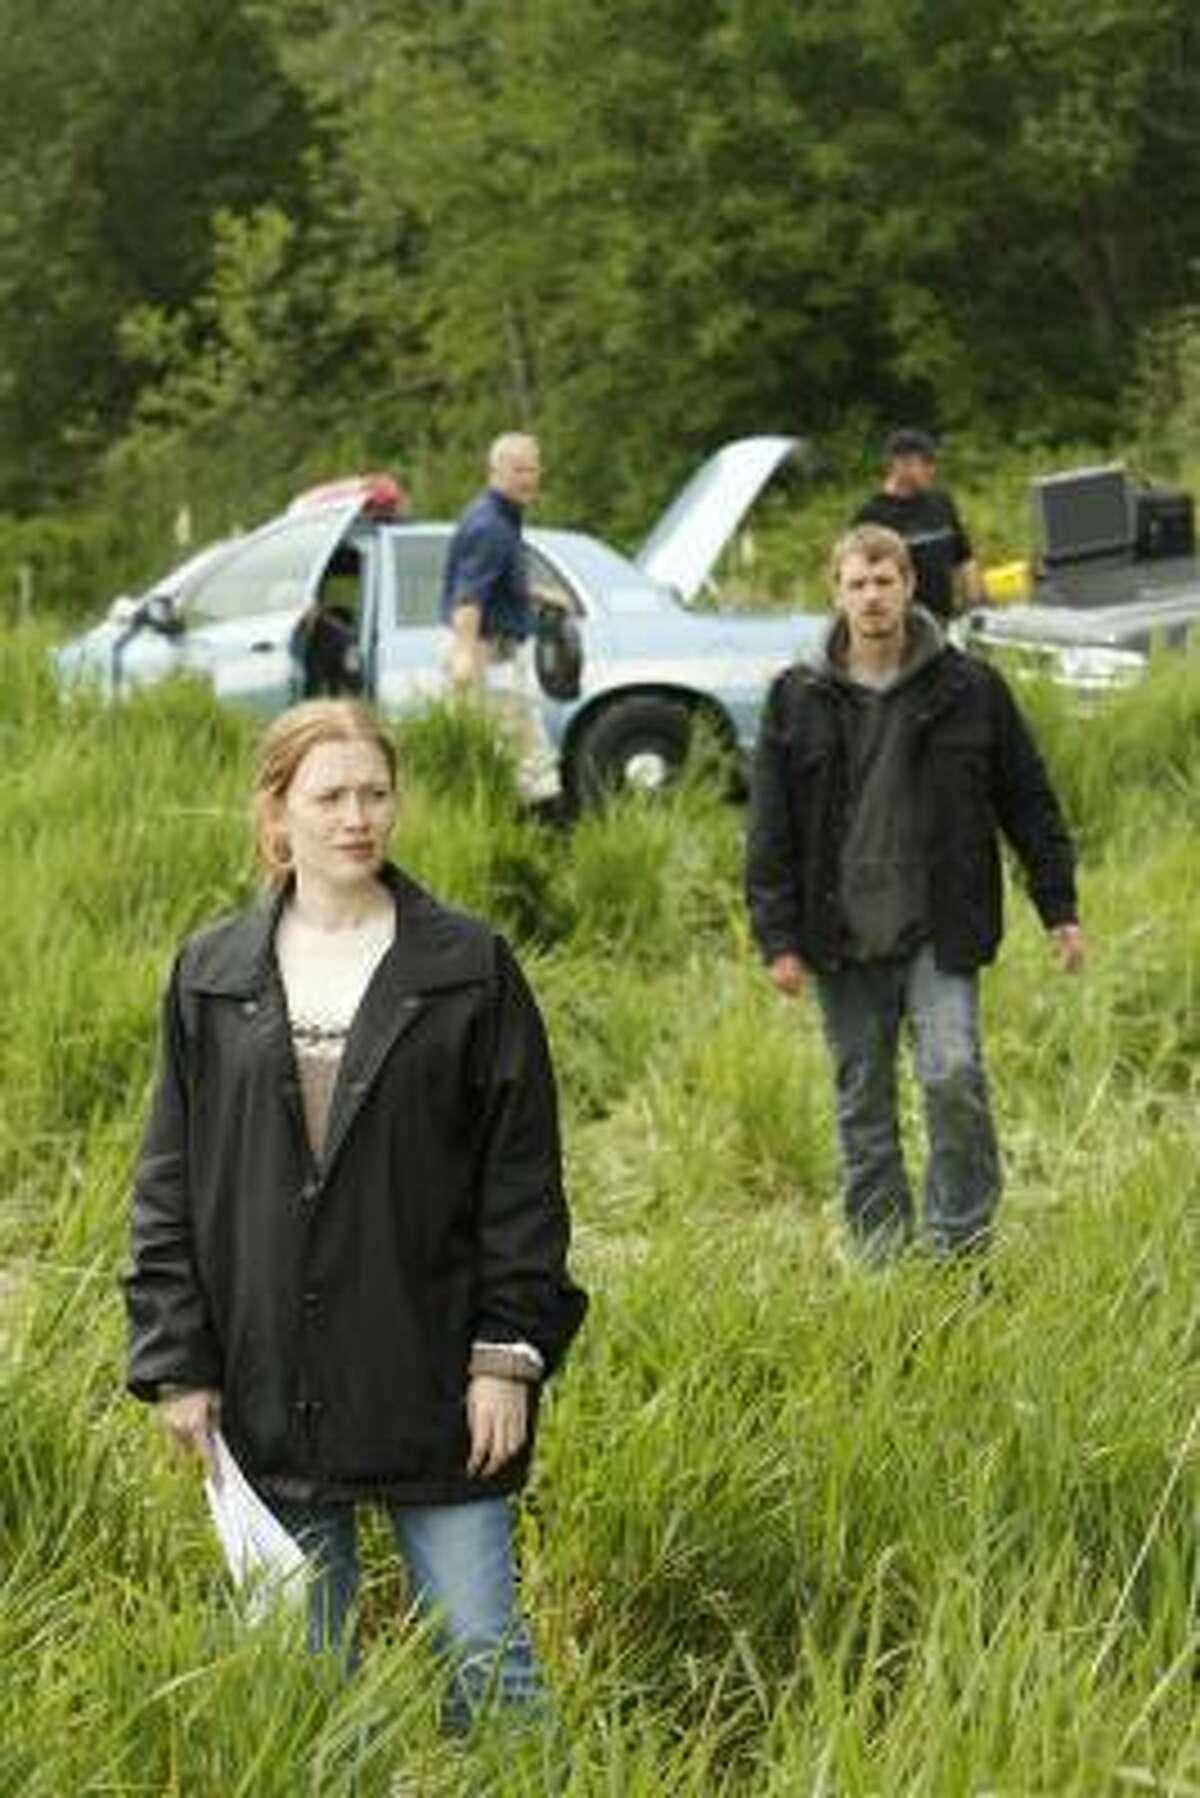 Houston native Mireille Enos portrays Detective Sarah Linden and Joel Kinnaman portrays Detective Stephen Holder in the AMC series The Killing.